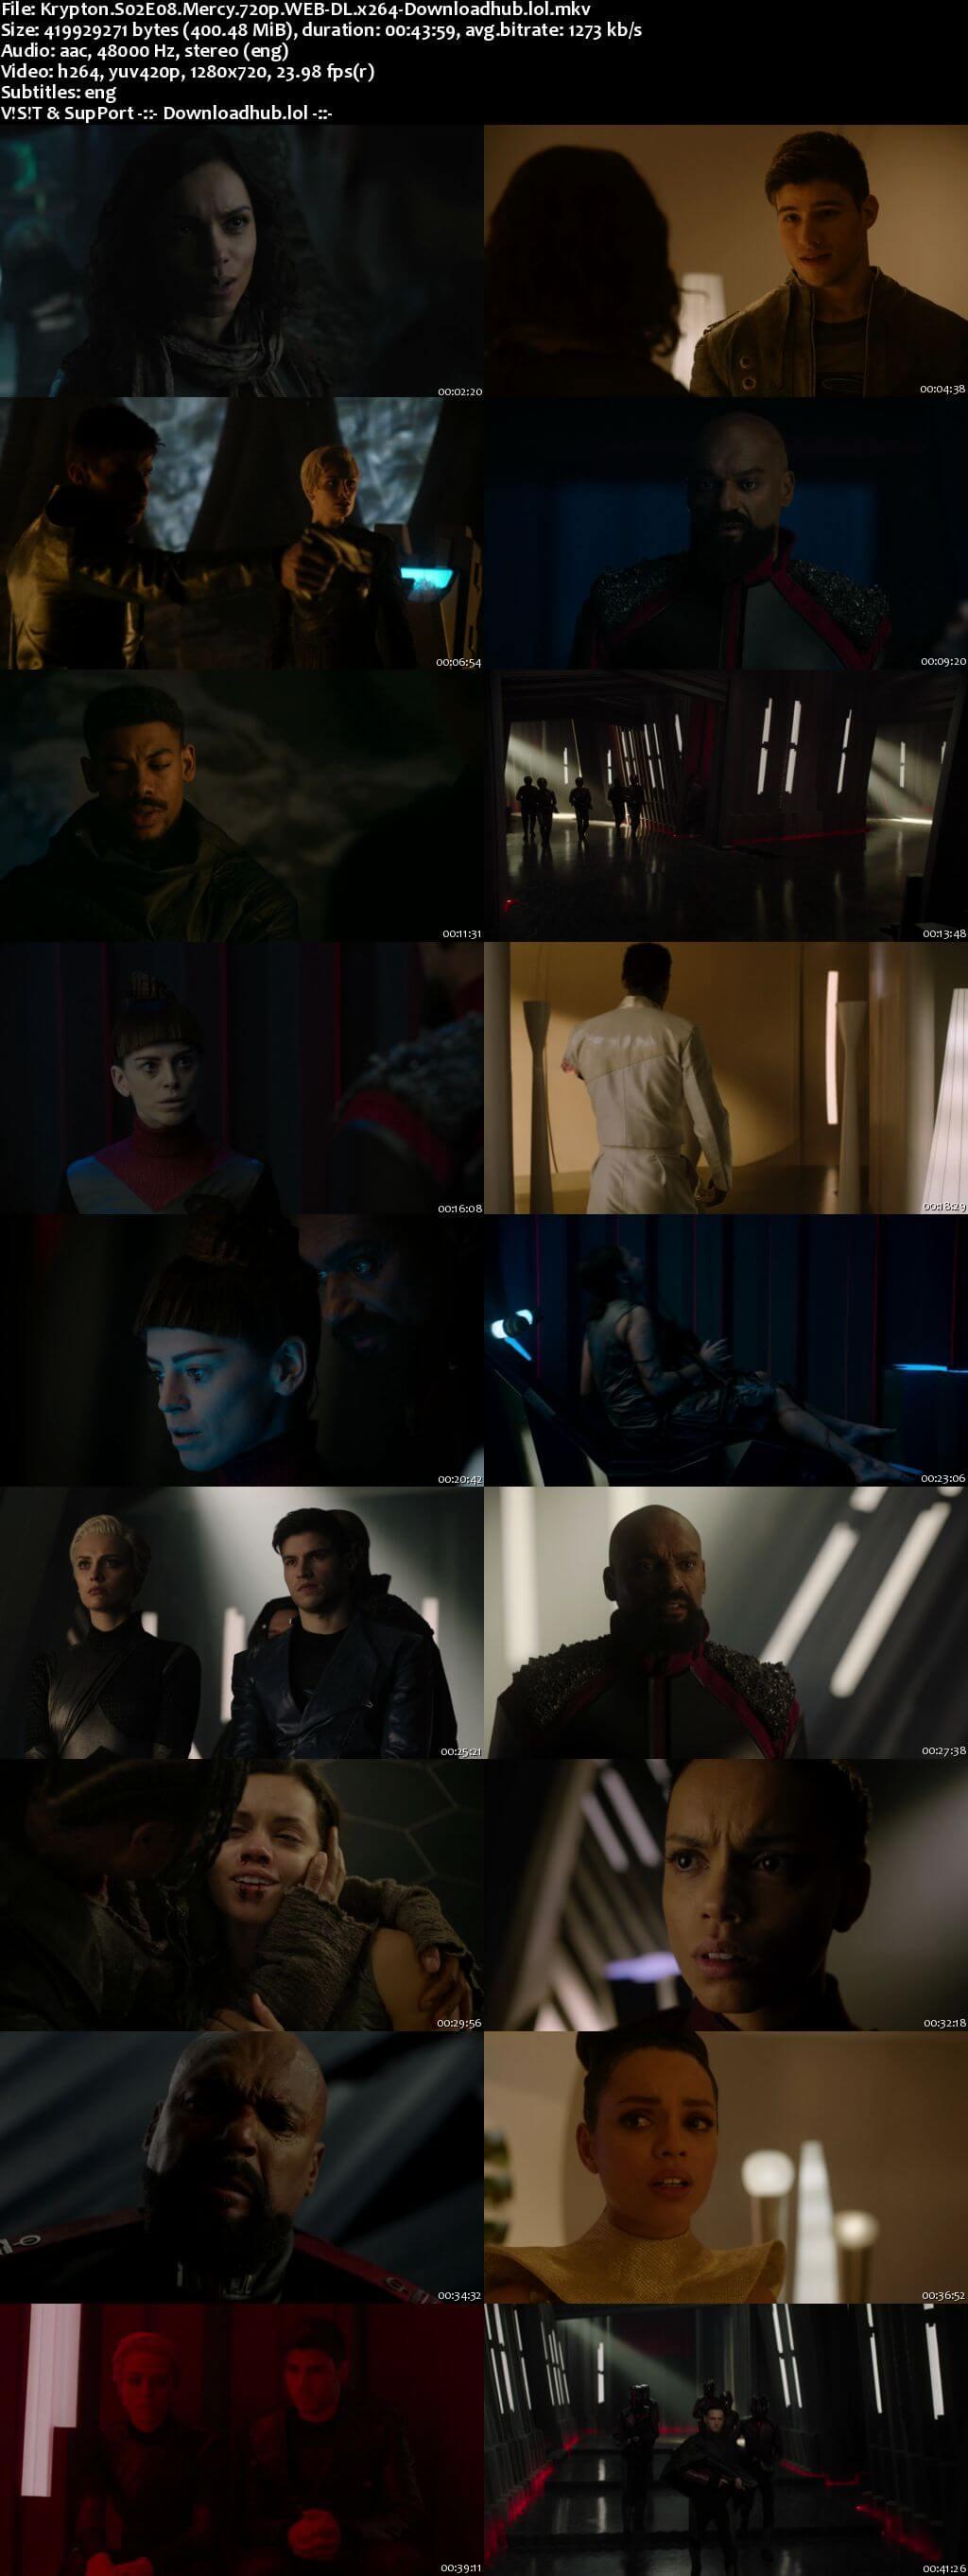 Krypton S02E08 400MB AMZN WEB-DL 720p ESubs